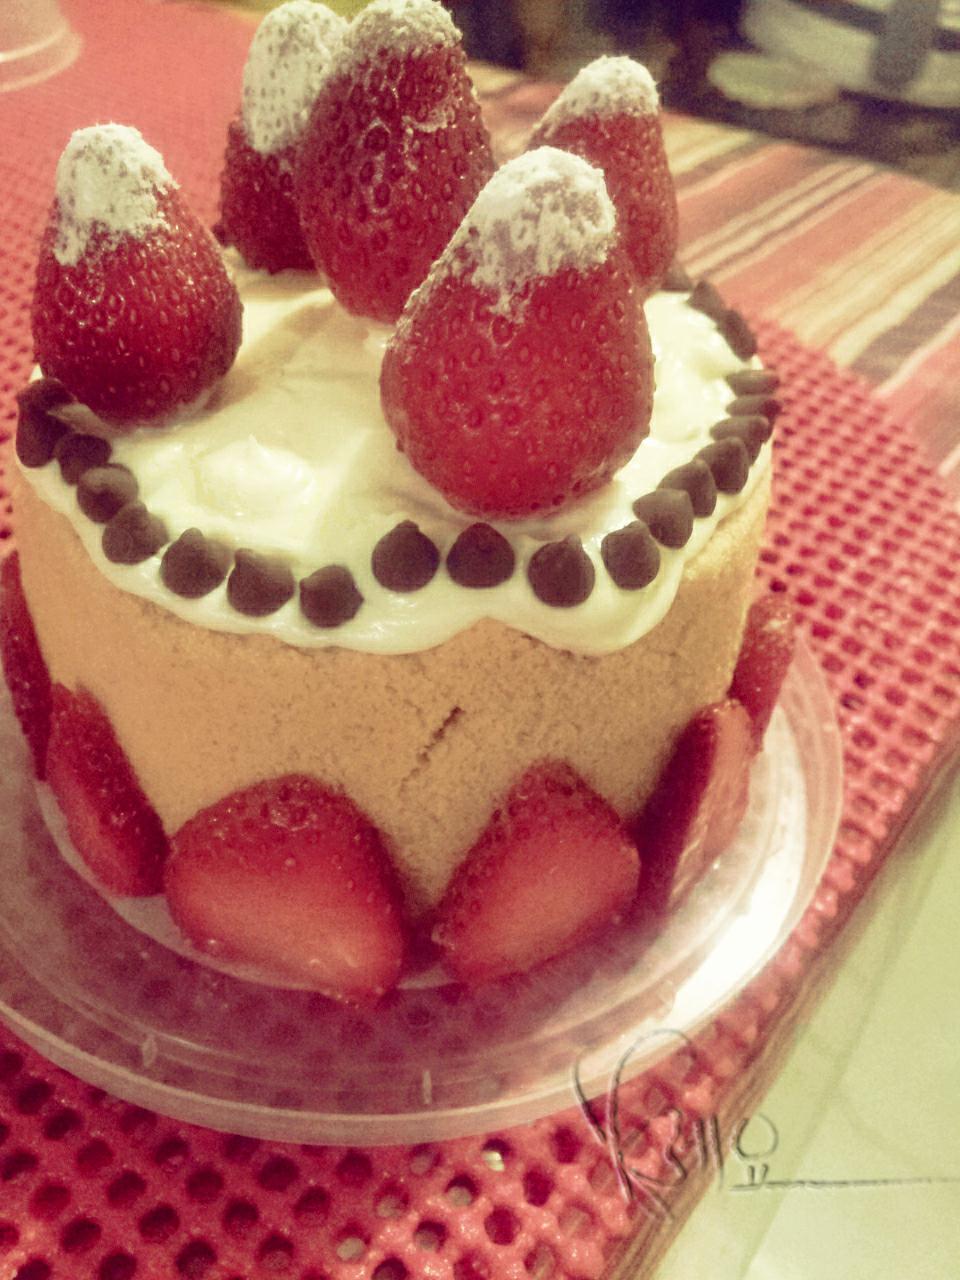 strawberry cake by keofome